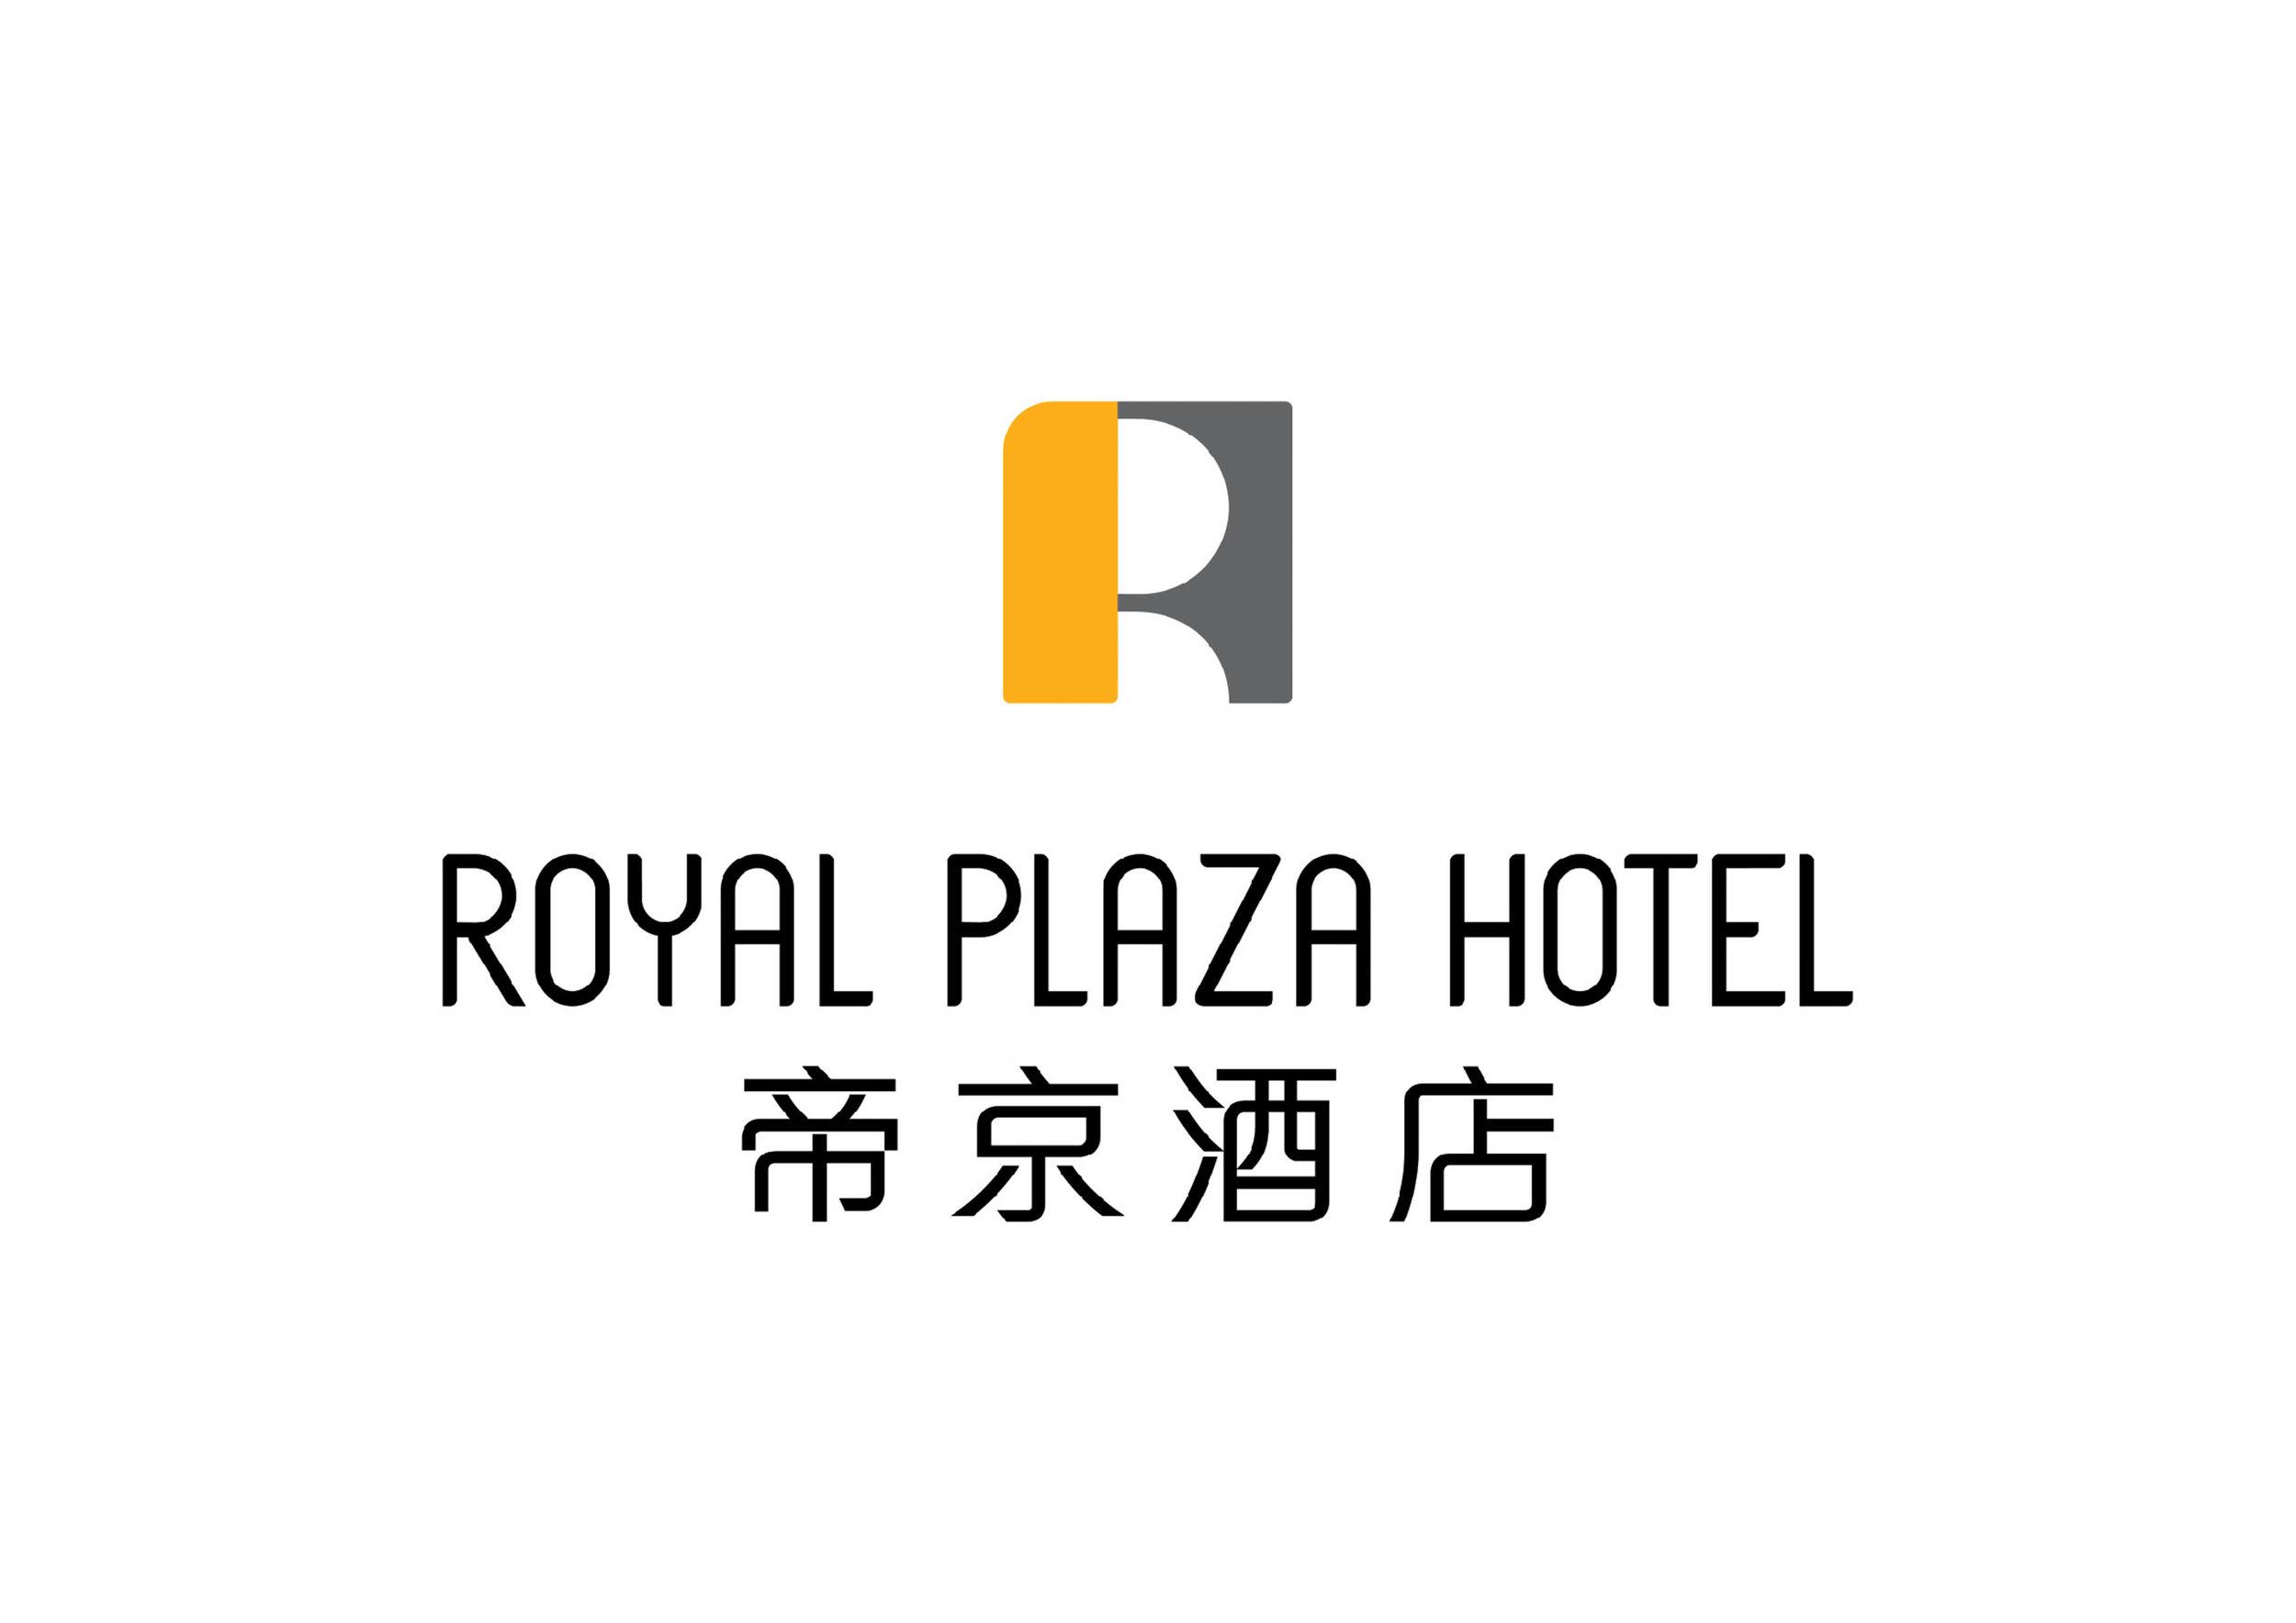 Royal Plaza Hotel.jpg